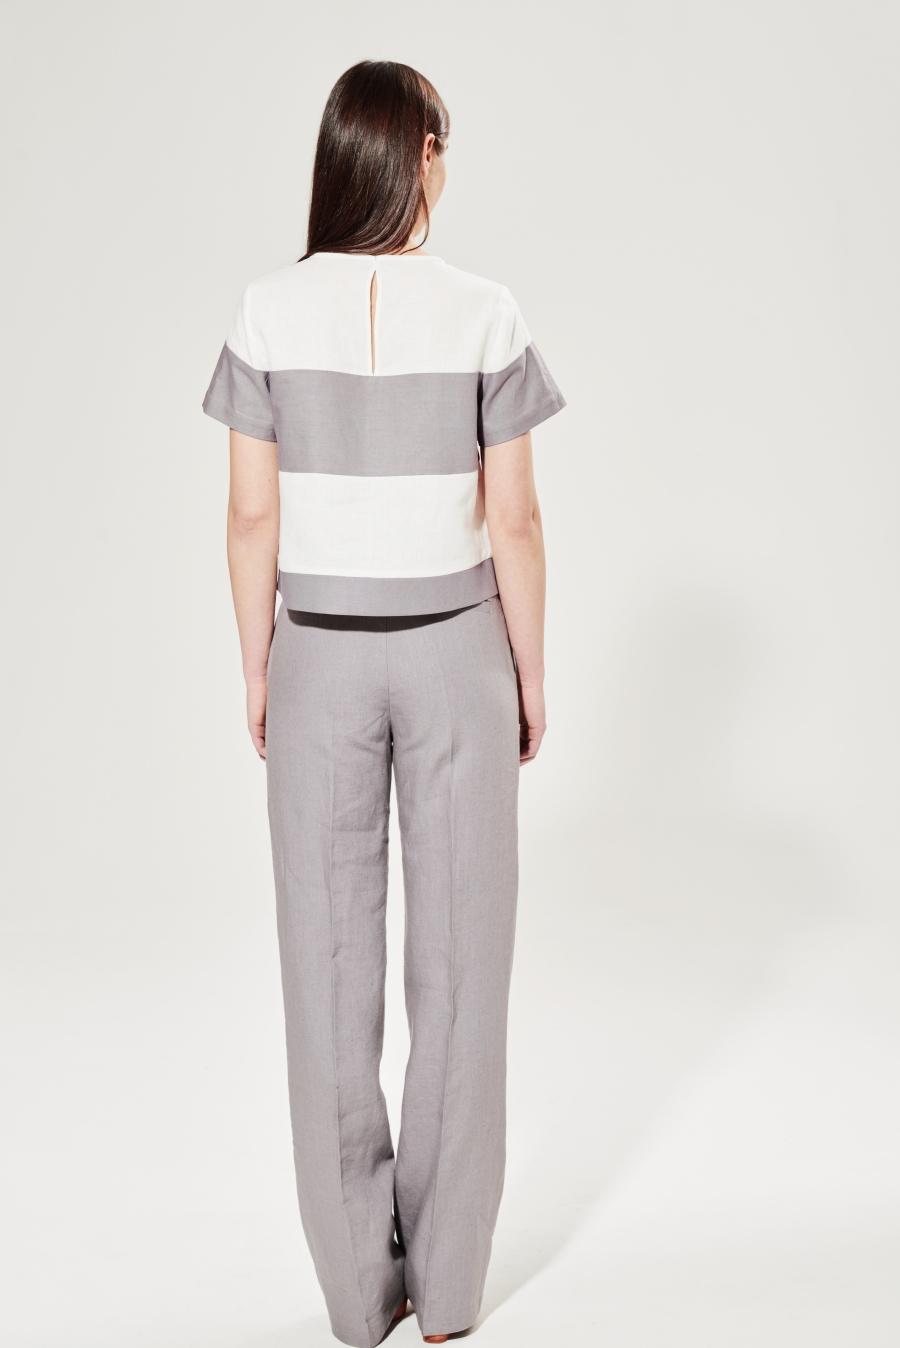 boxy linen shirt scaled